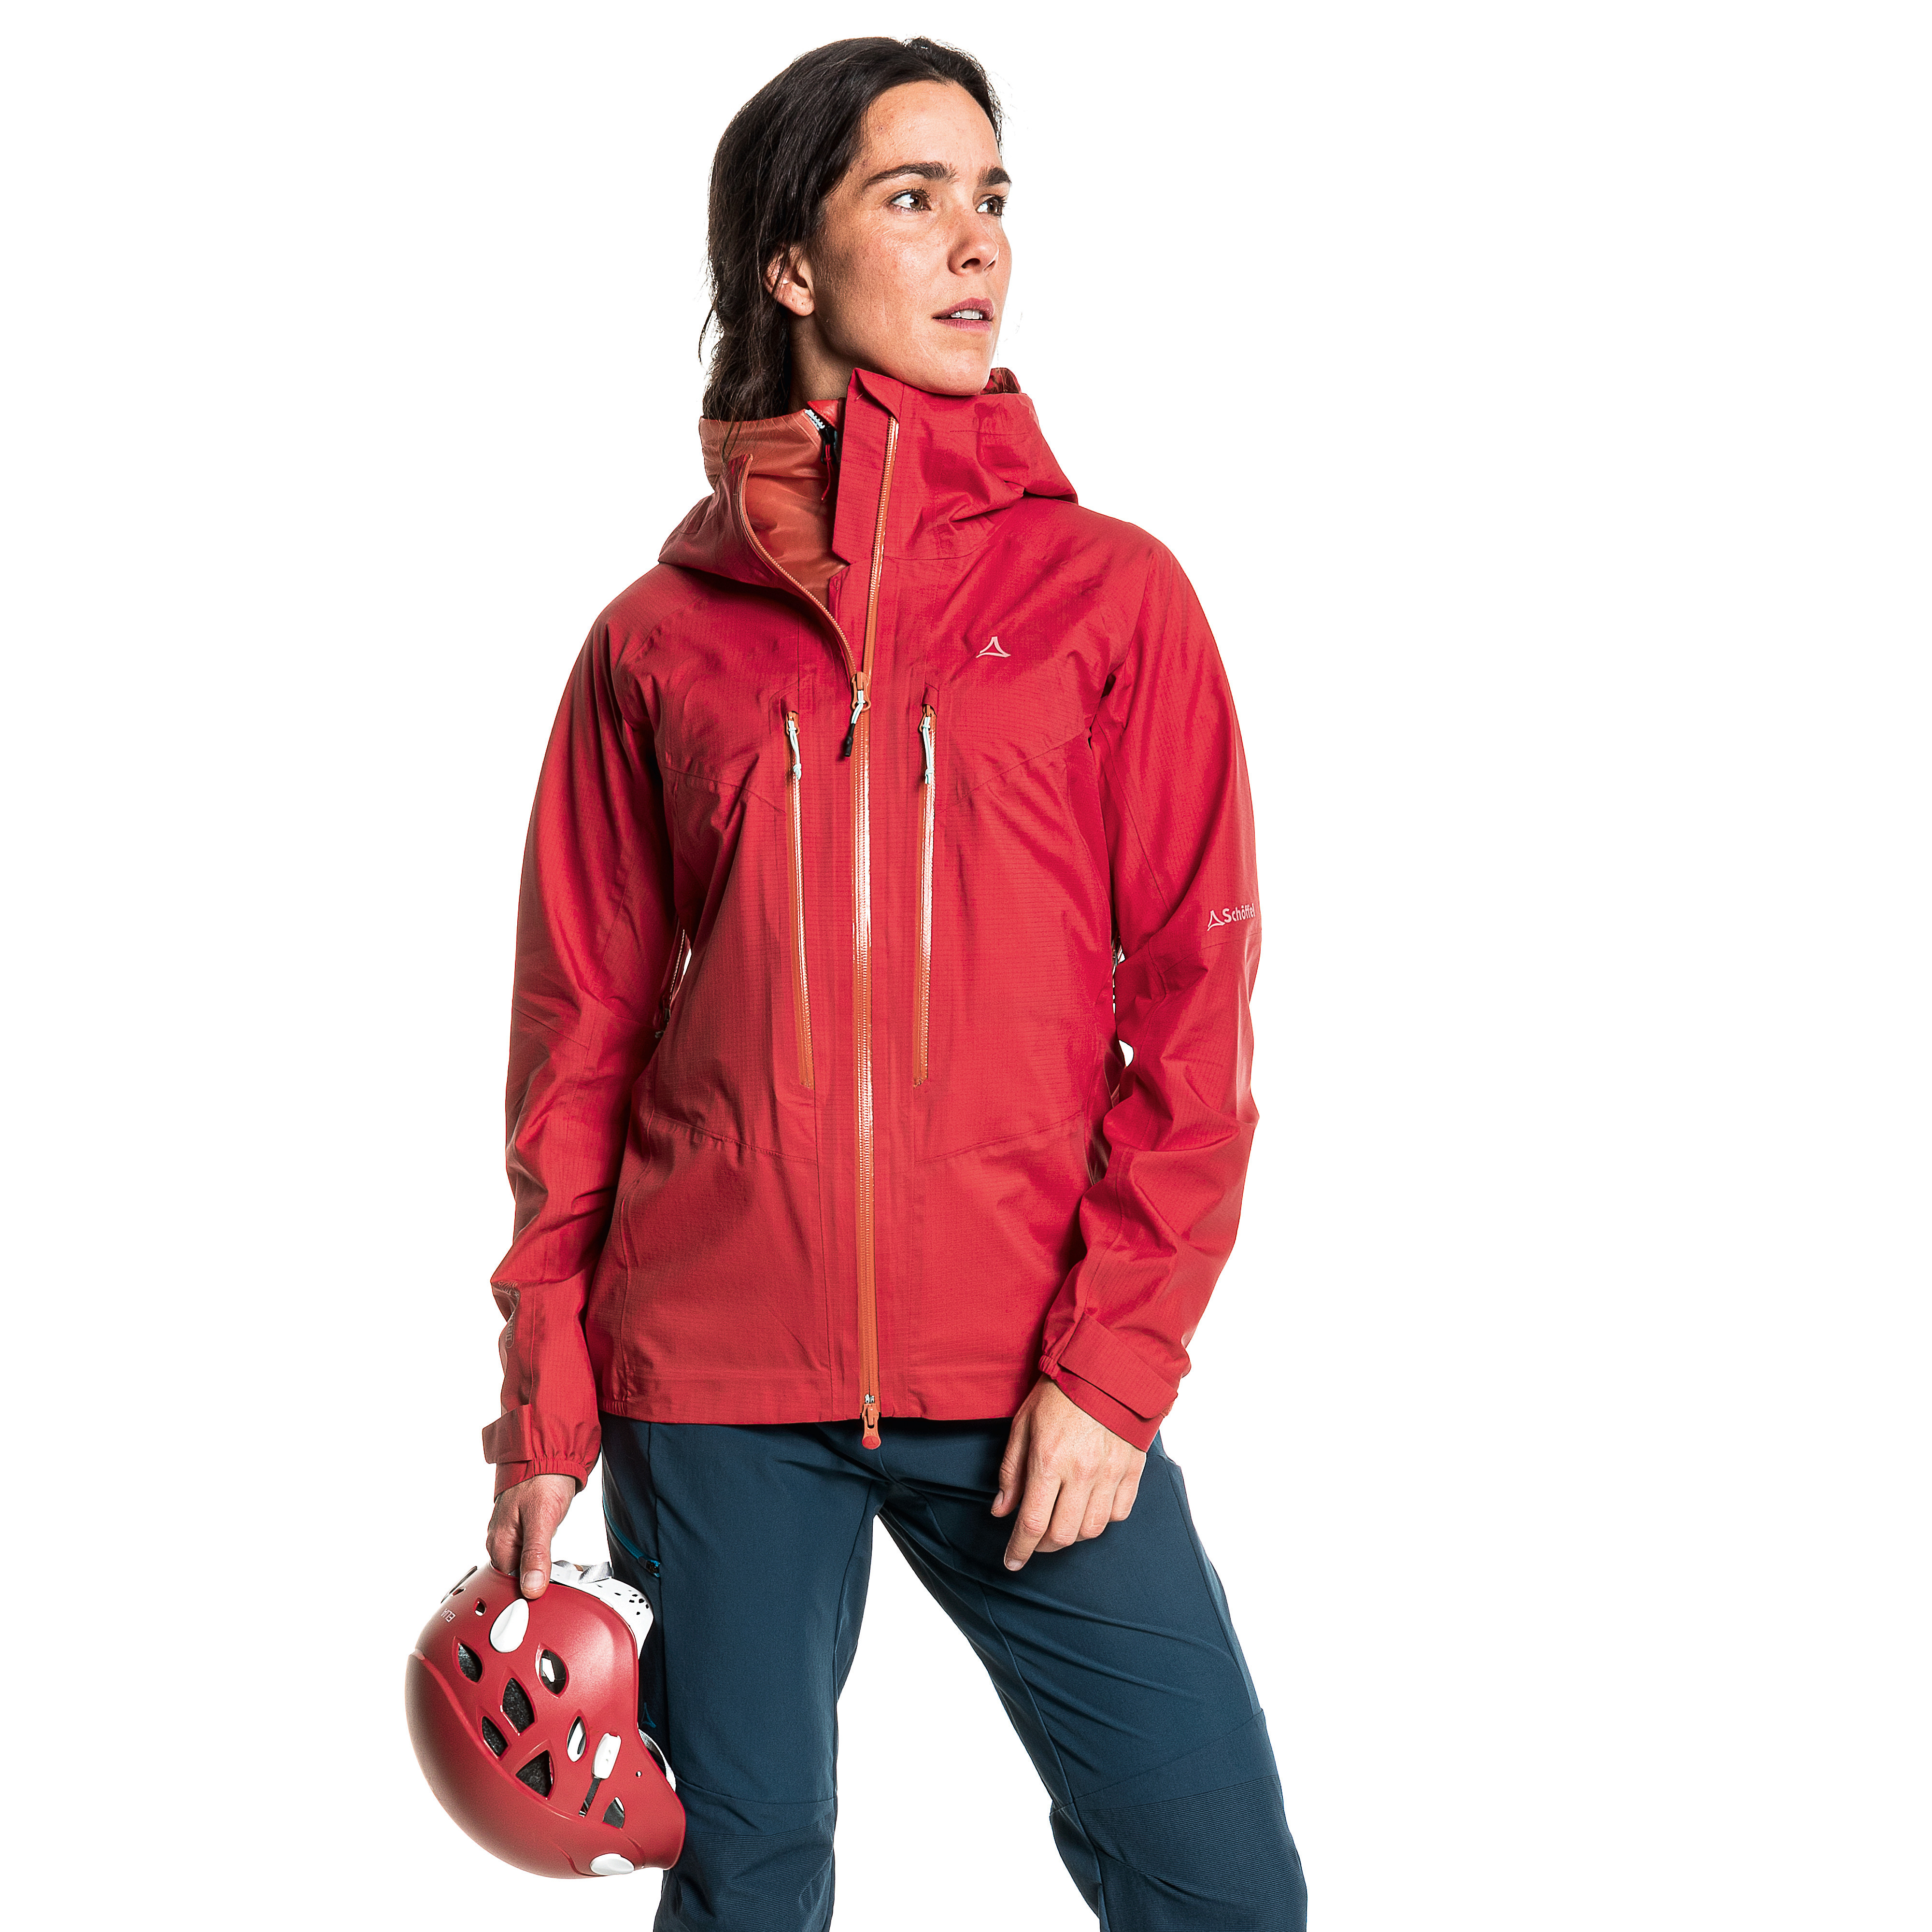 SCHÖFFEL 3L Jacket Rothorn L